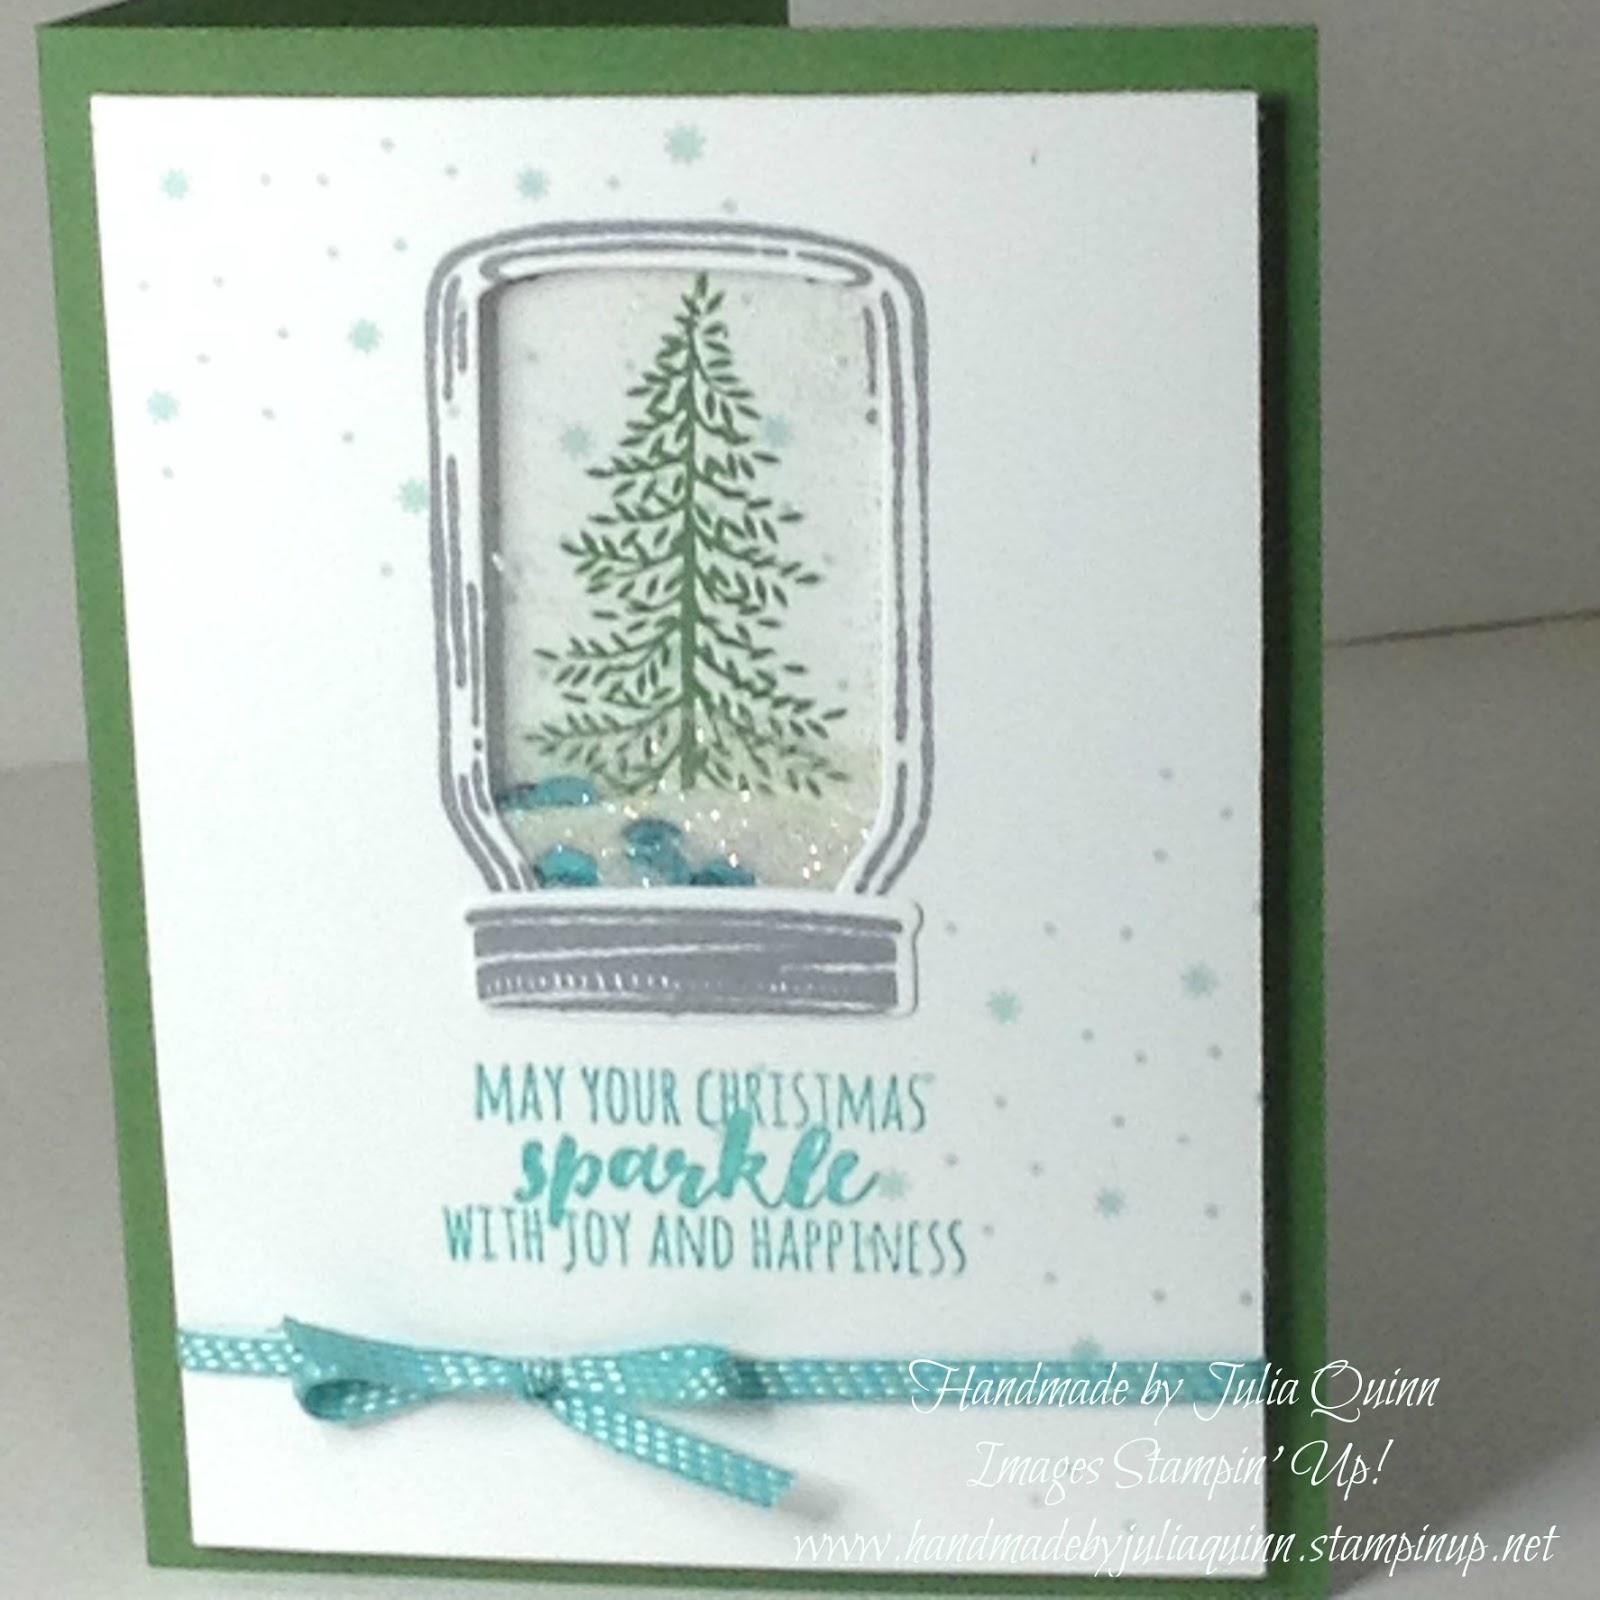 handmadejulia quinn  cardmaking and supplies stampin